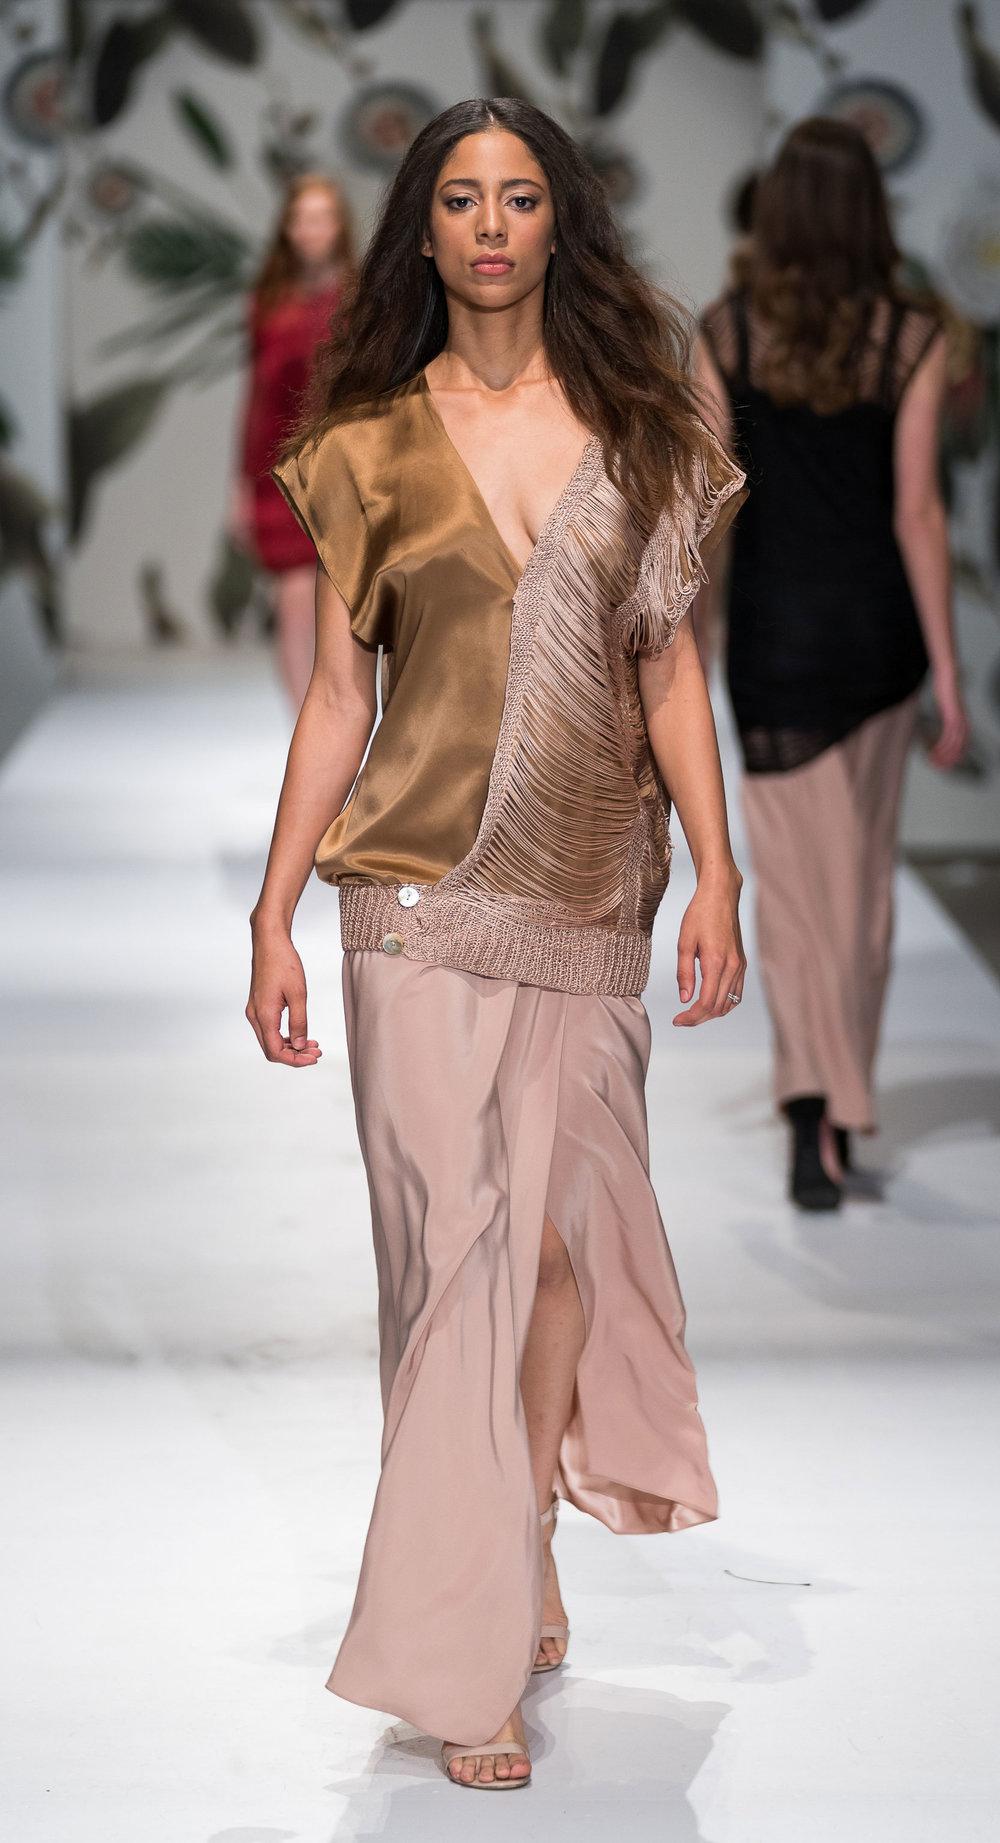 Masha-Osoianu-Design-(12).jpg